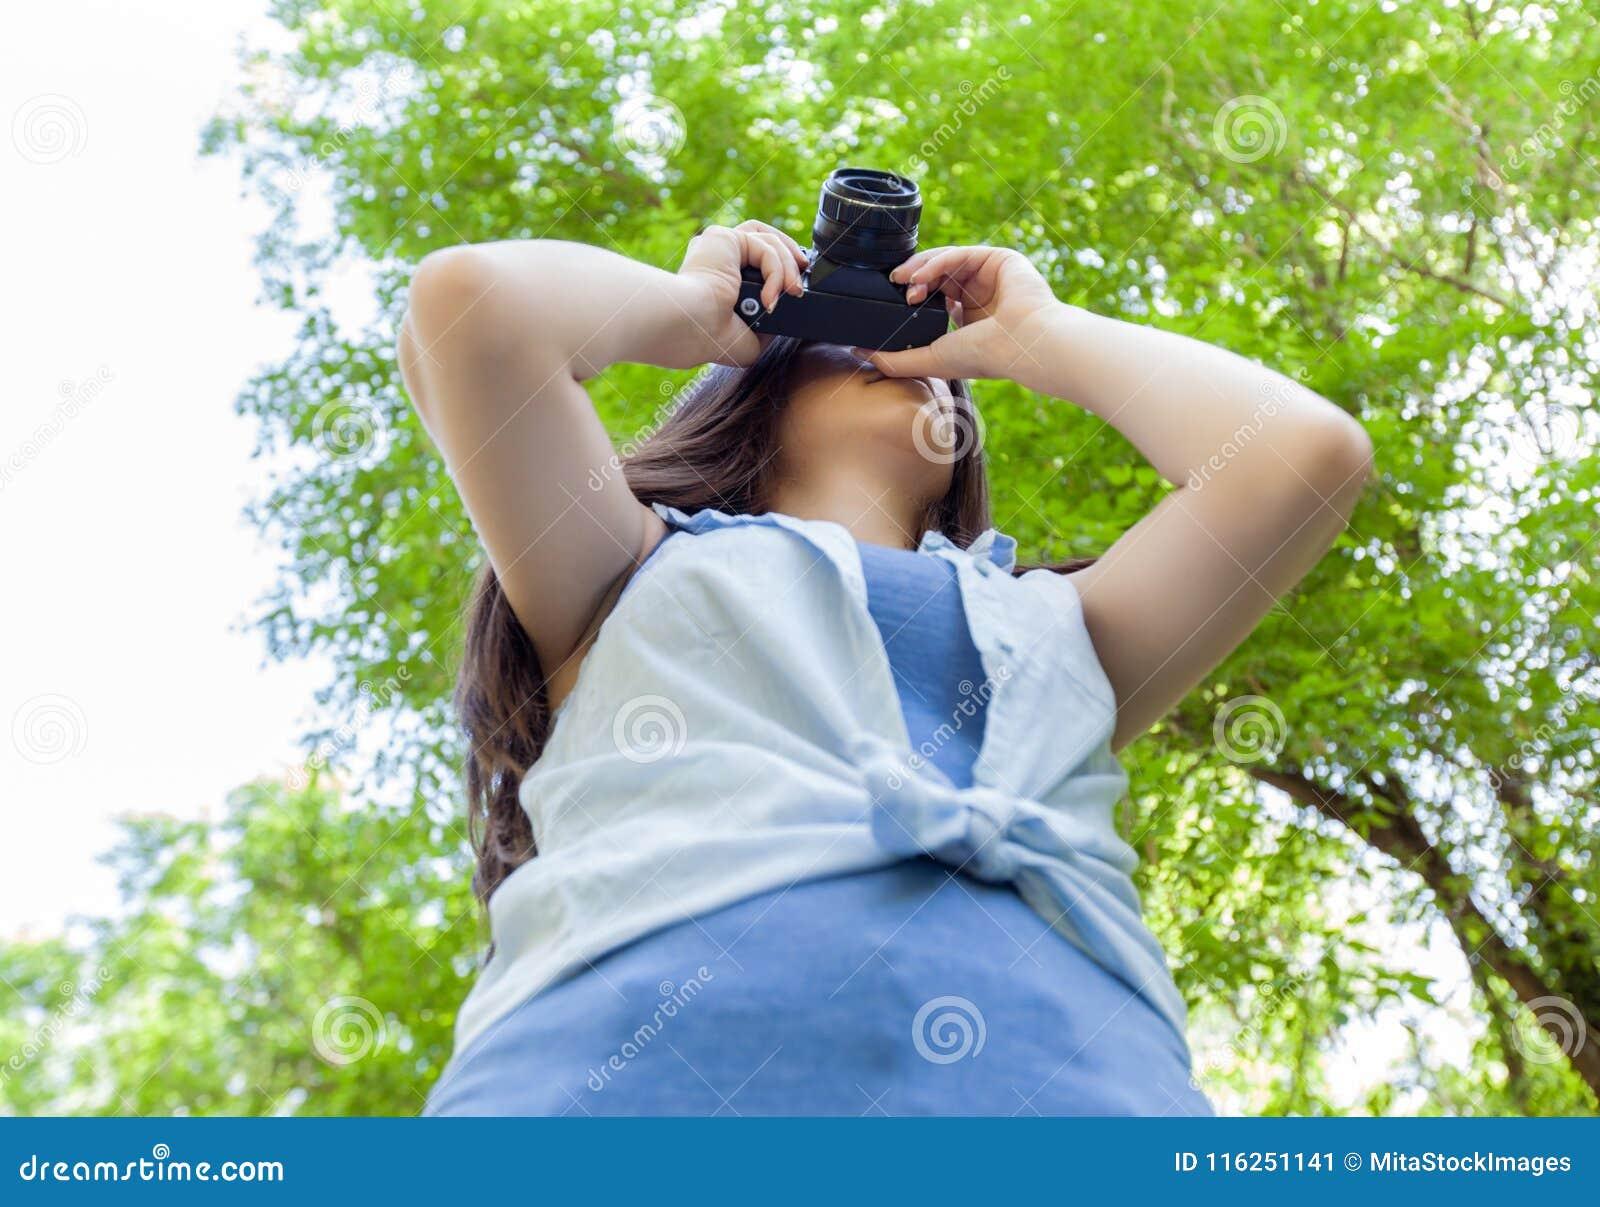 Amateurphotograph Outdoor